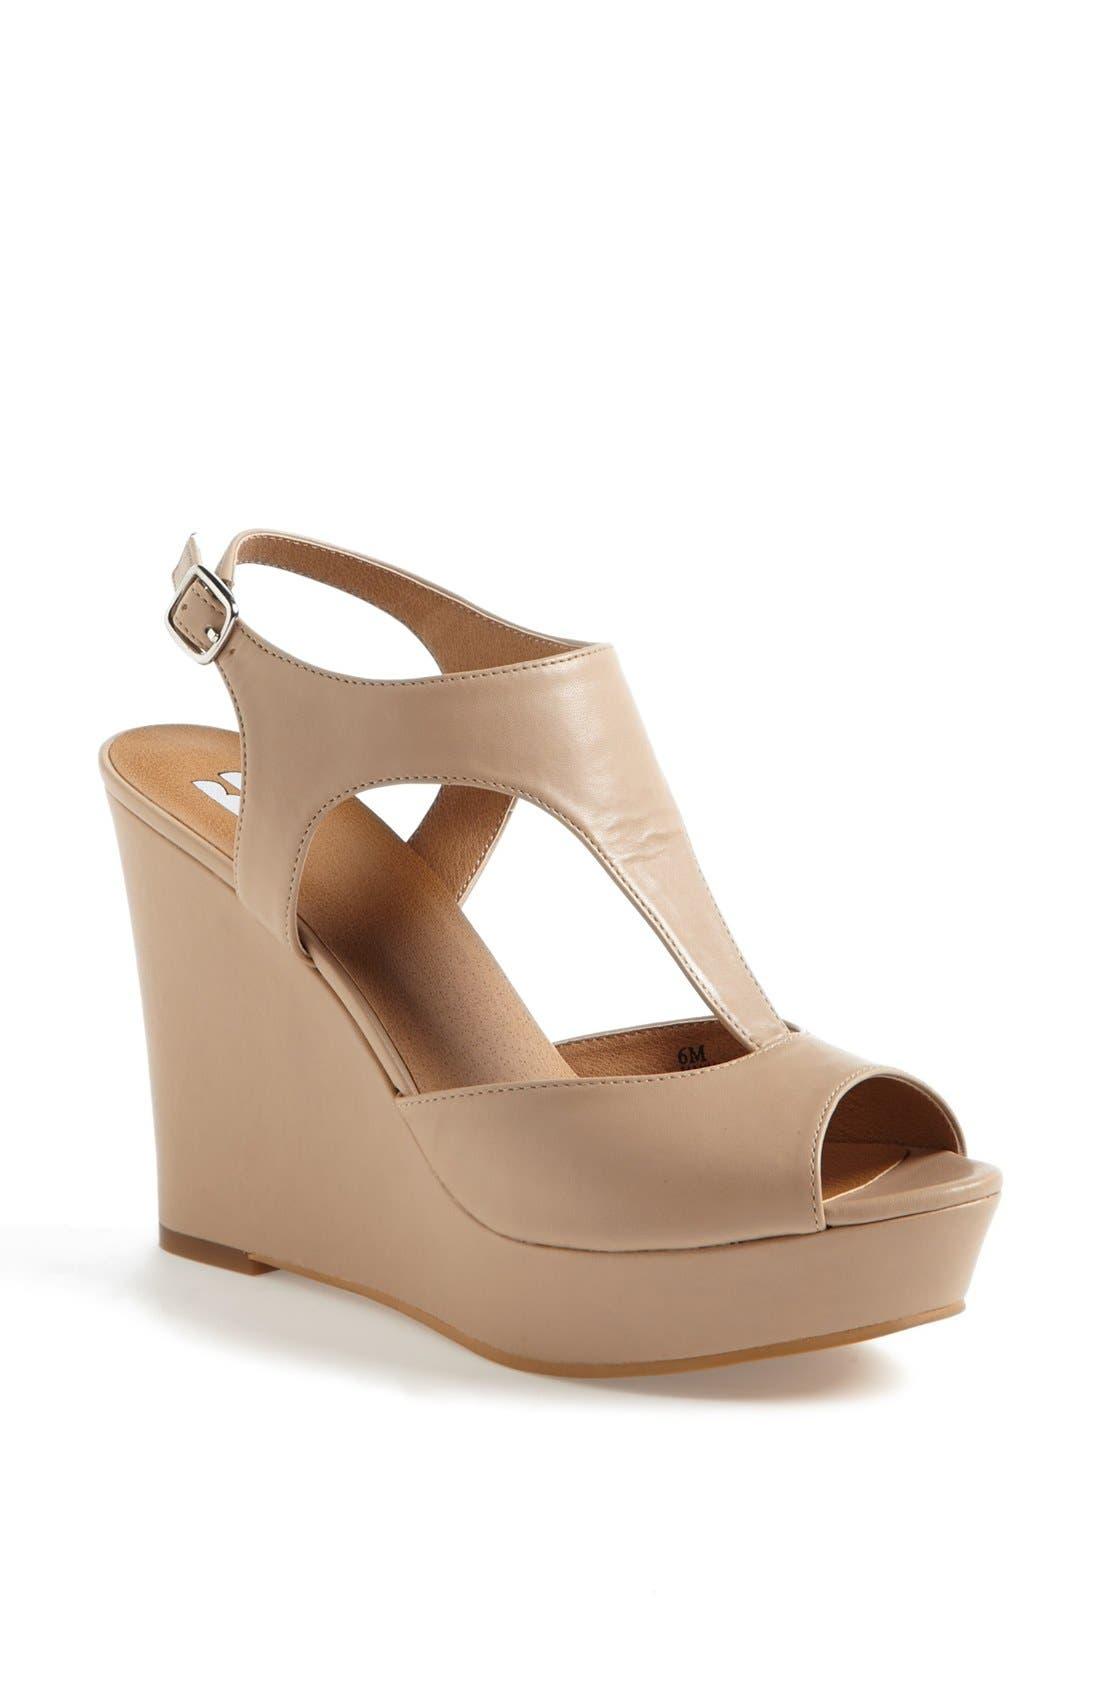 Alternate Image 1 Selected - BP. 'Springs' Wedge Sandal (Women)